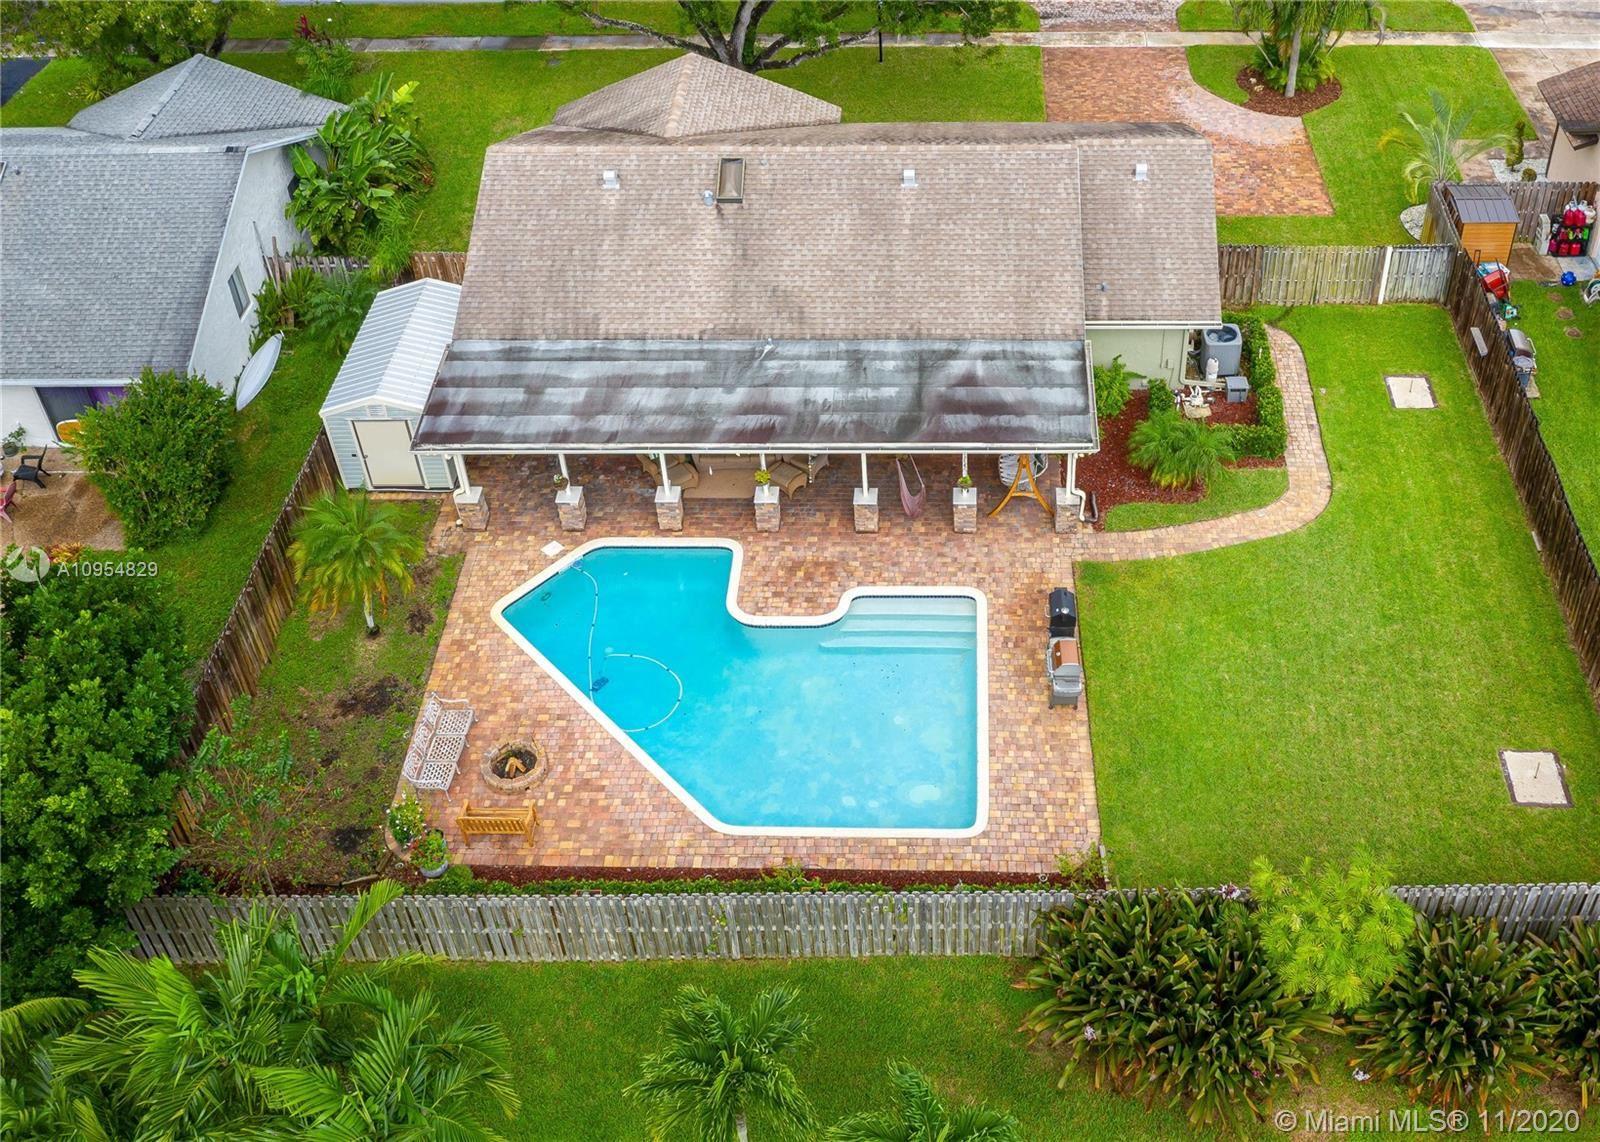 Photo of 9140 NW 17th St, Plantation, FL 33322 (MLS # A10954829)